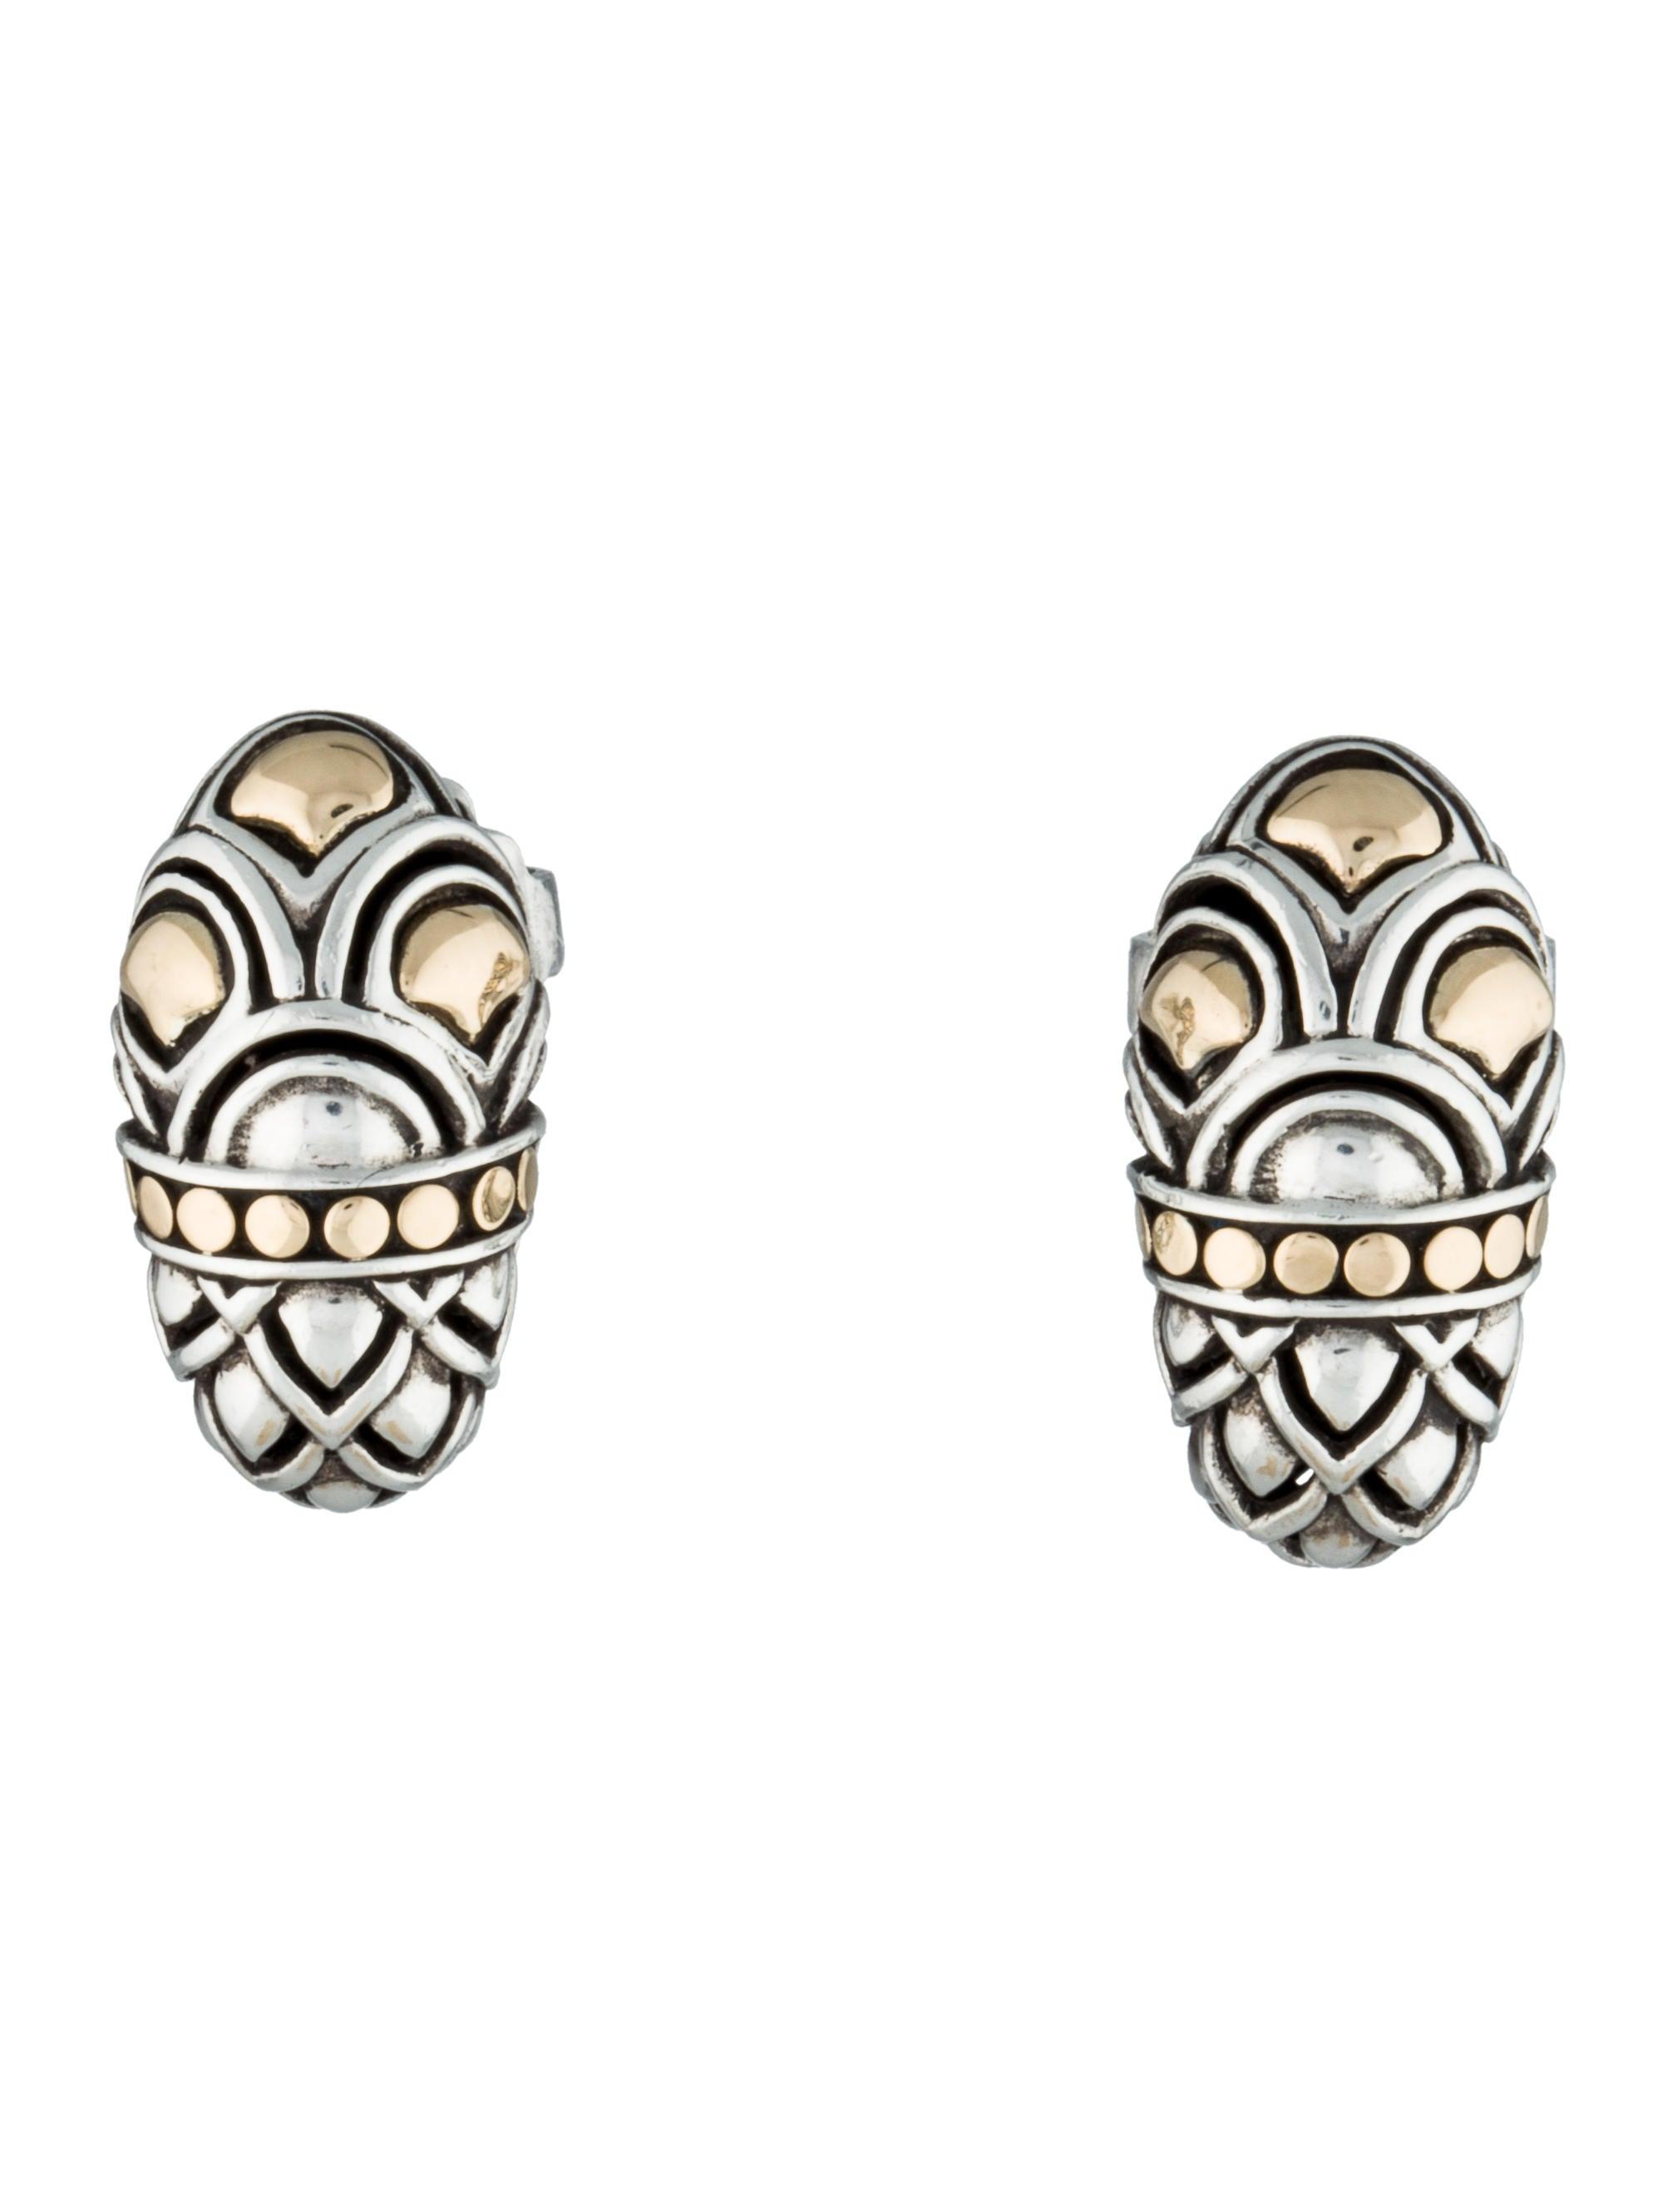 Naga Shrimp Earrings